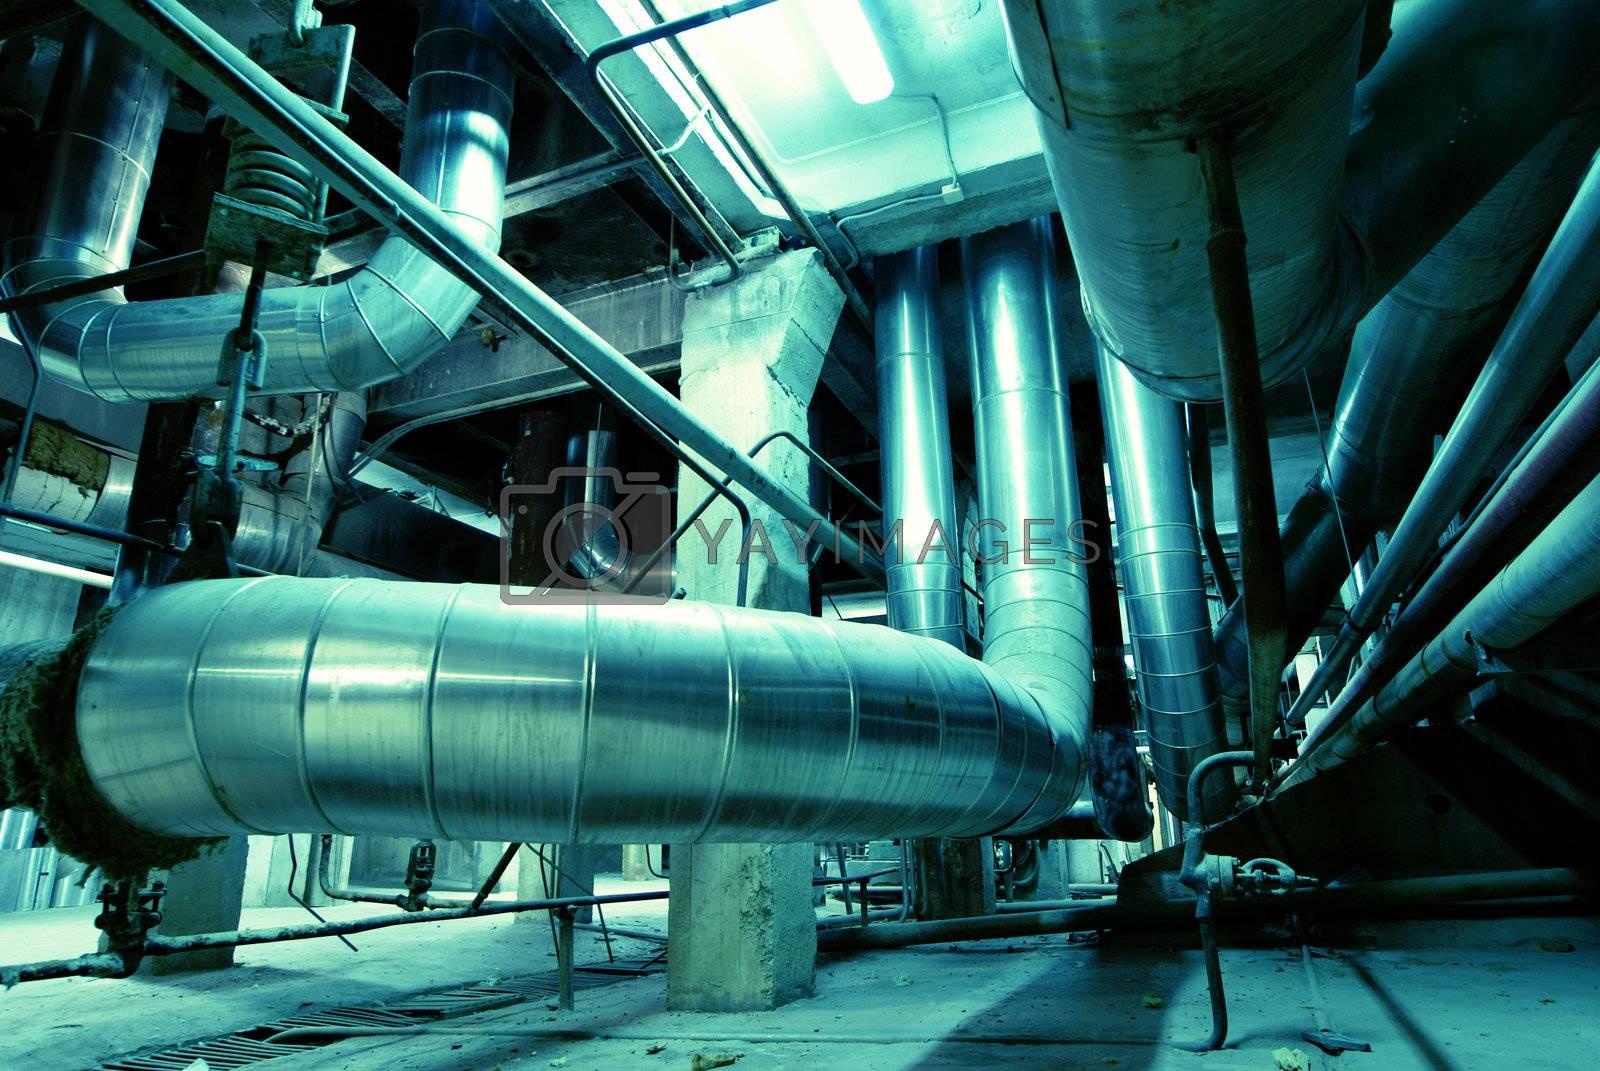 Industrial zone, Steel pipelines in blue tones   by nostal6ie